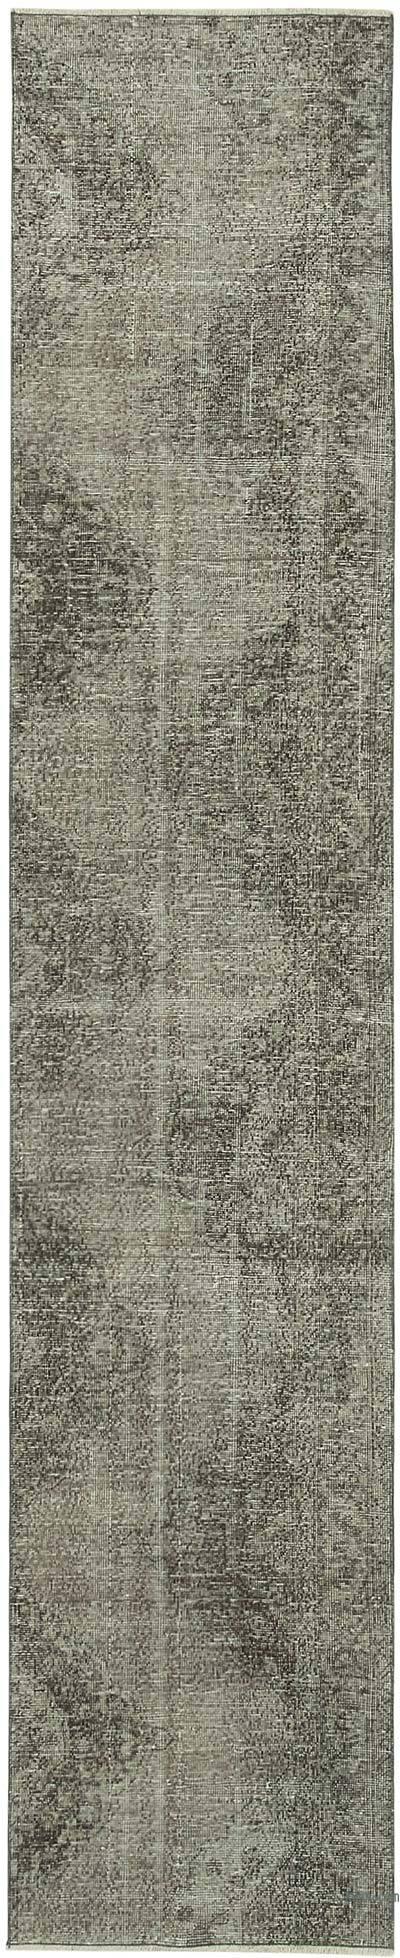 Gris Alfombra de Pasillo Turca Vintage Sobreteñida - 71 cm x 352 cm